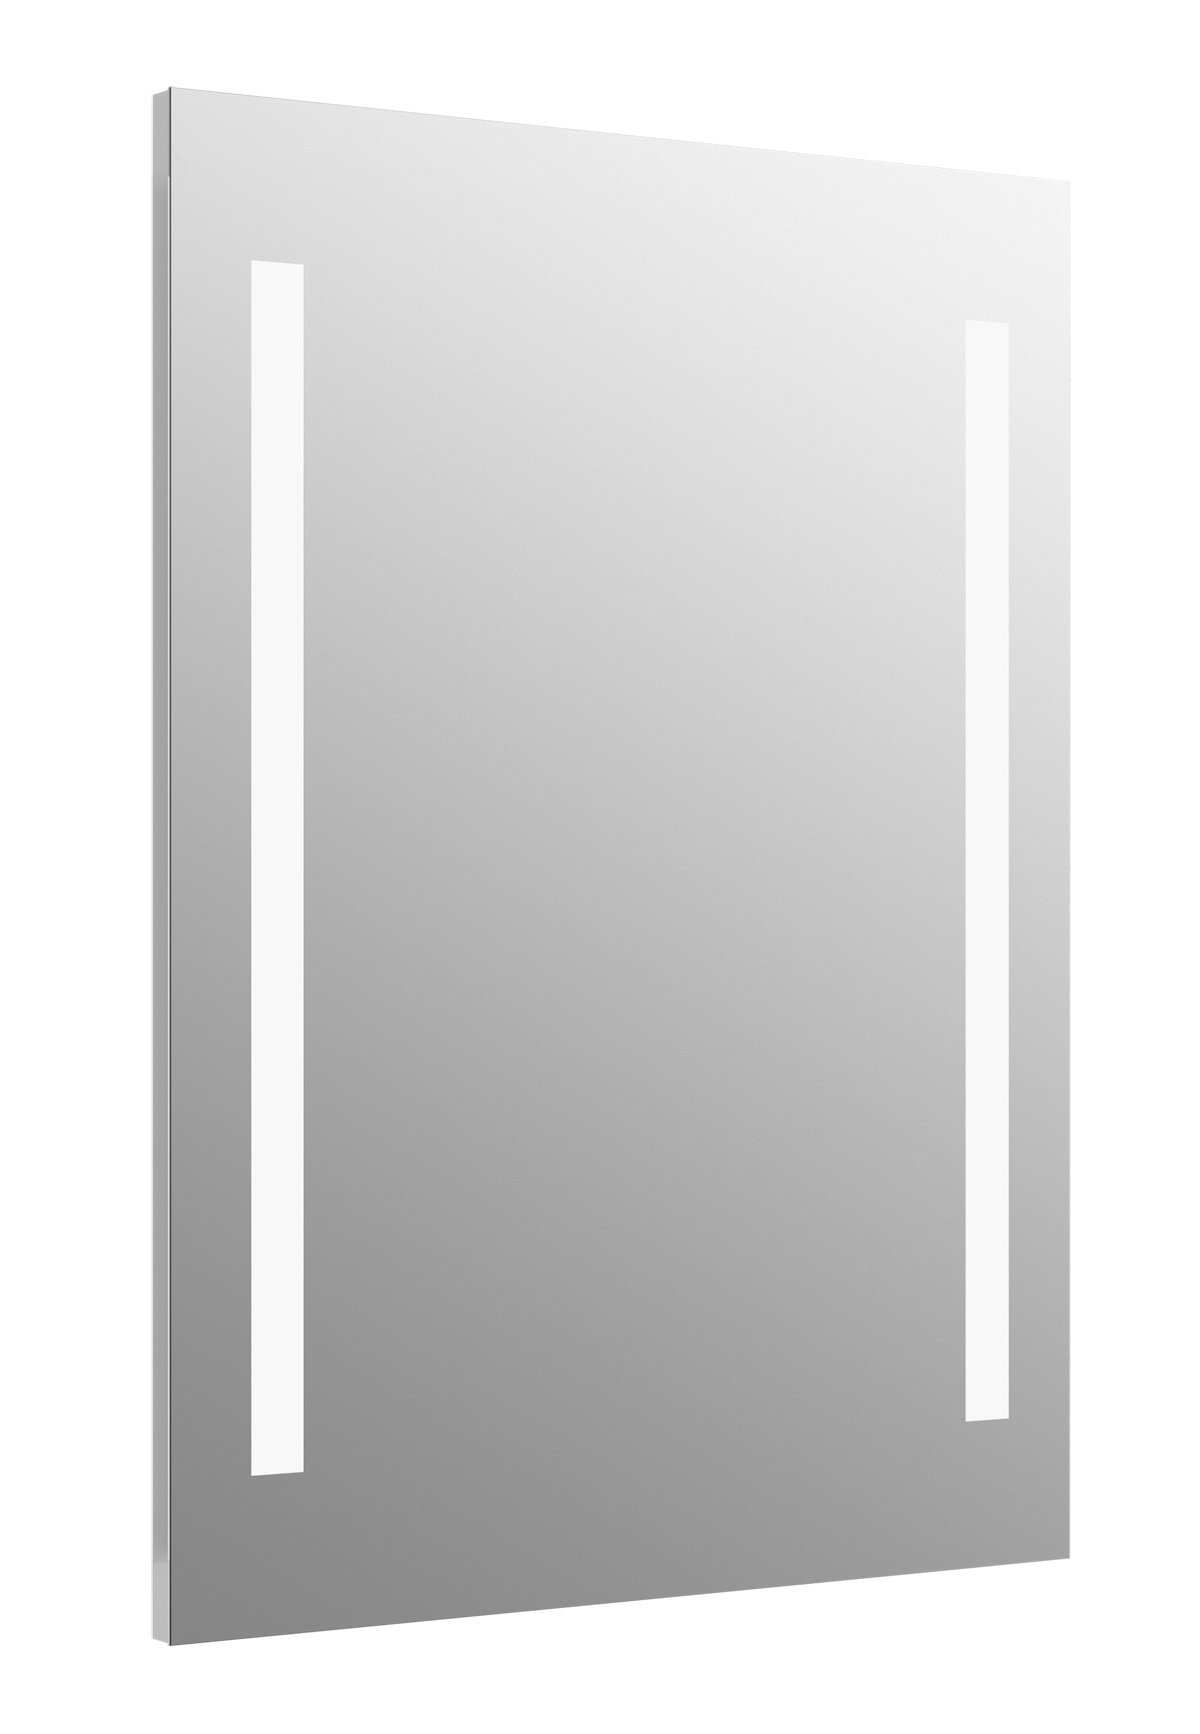 KOHLER 99571-TL-NA Verdera Lighted Mirror, Aluminum, 24''x33''